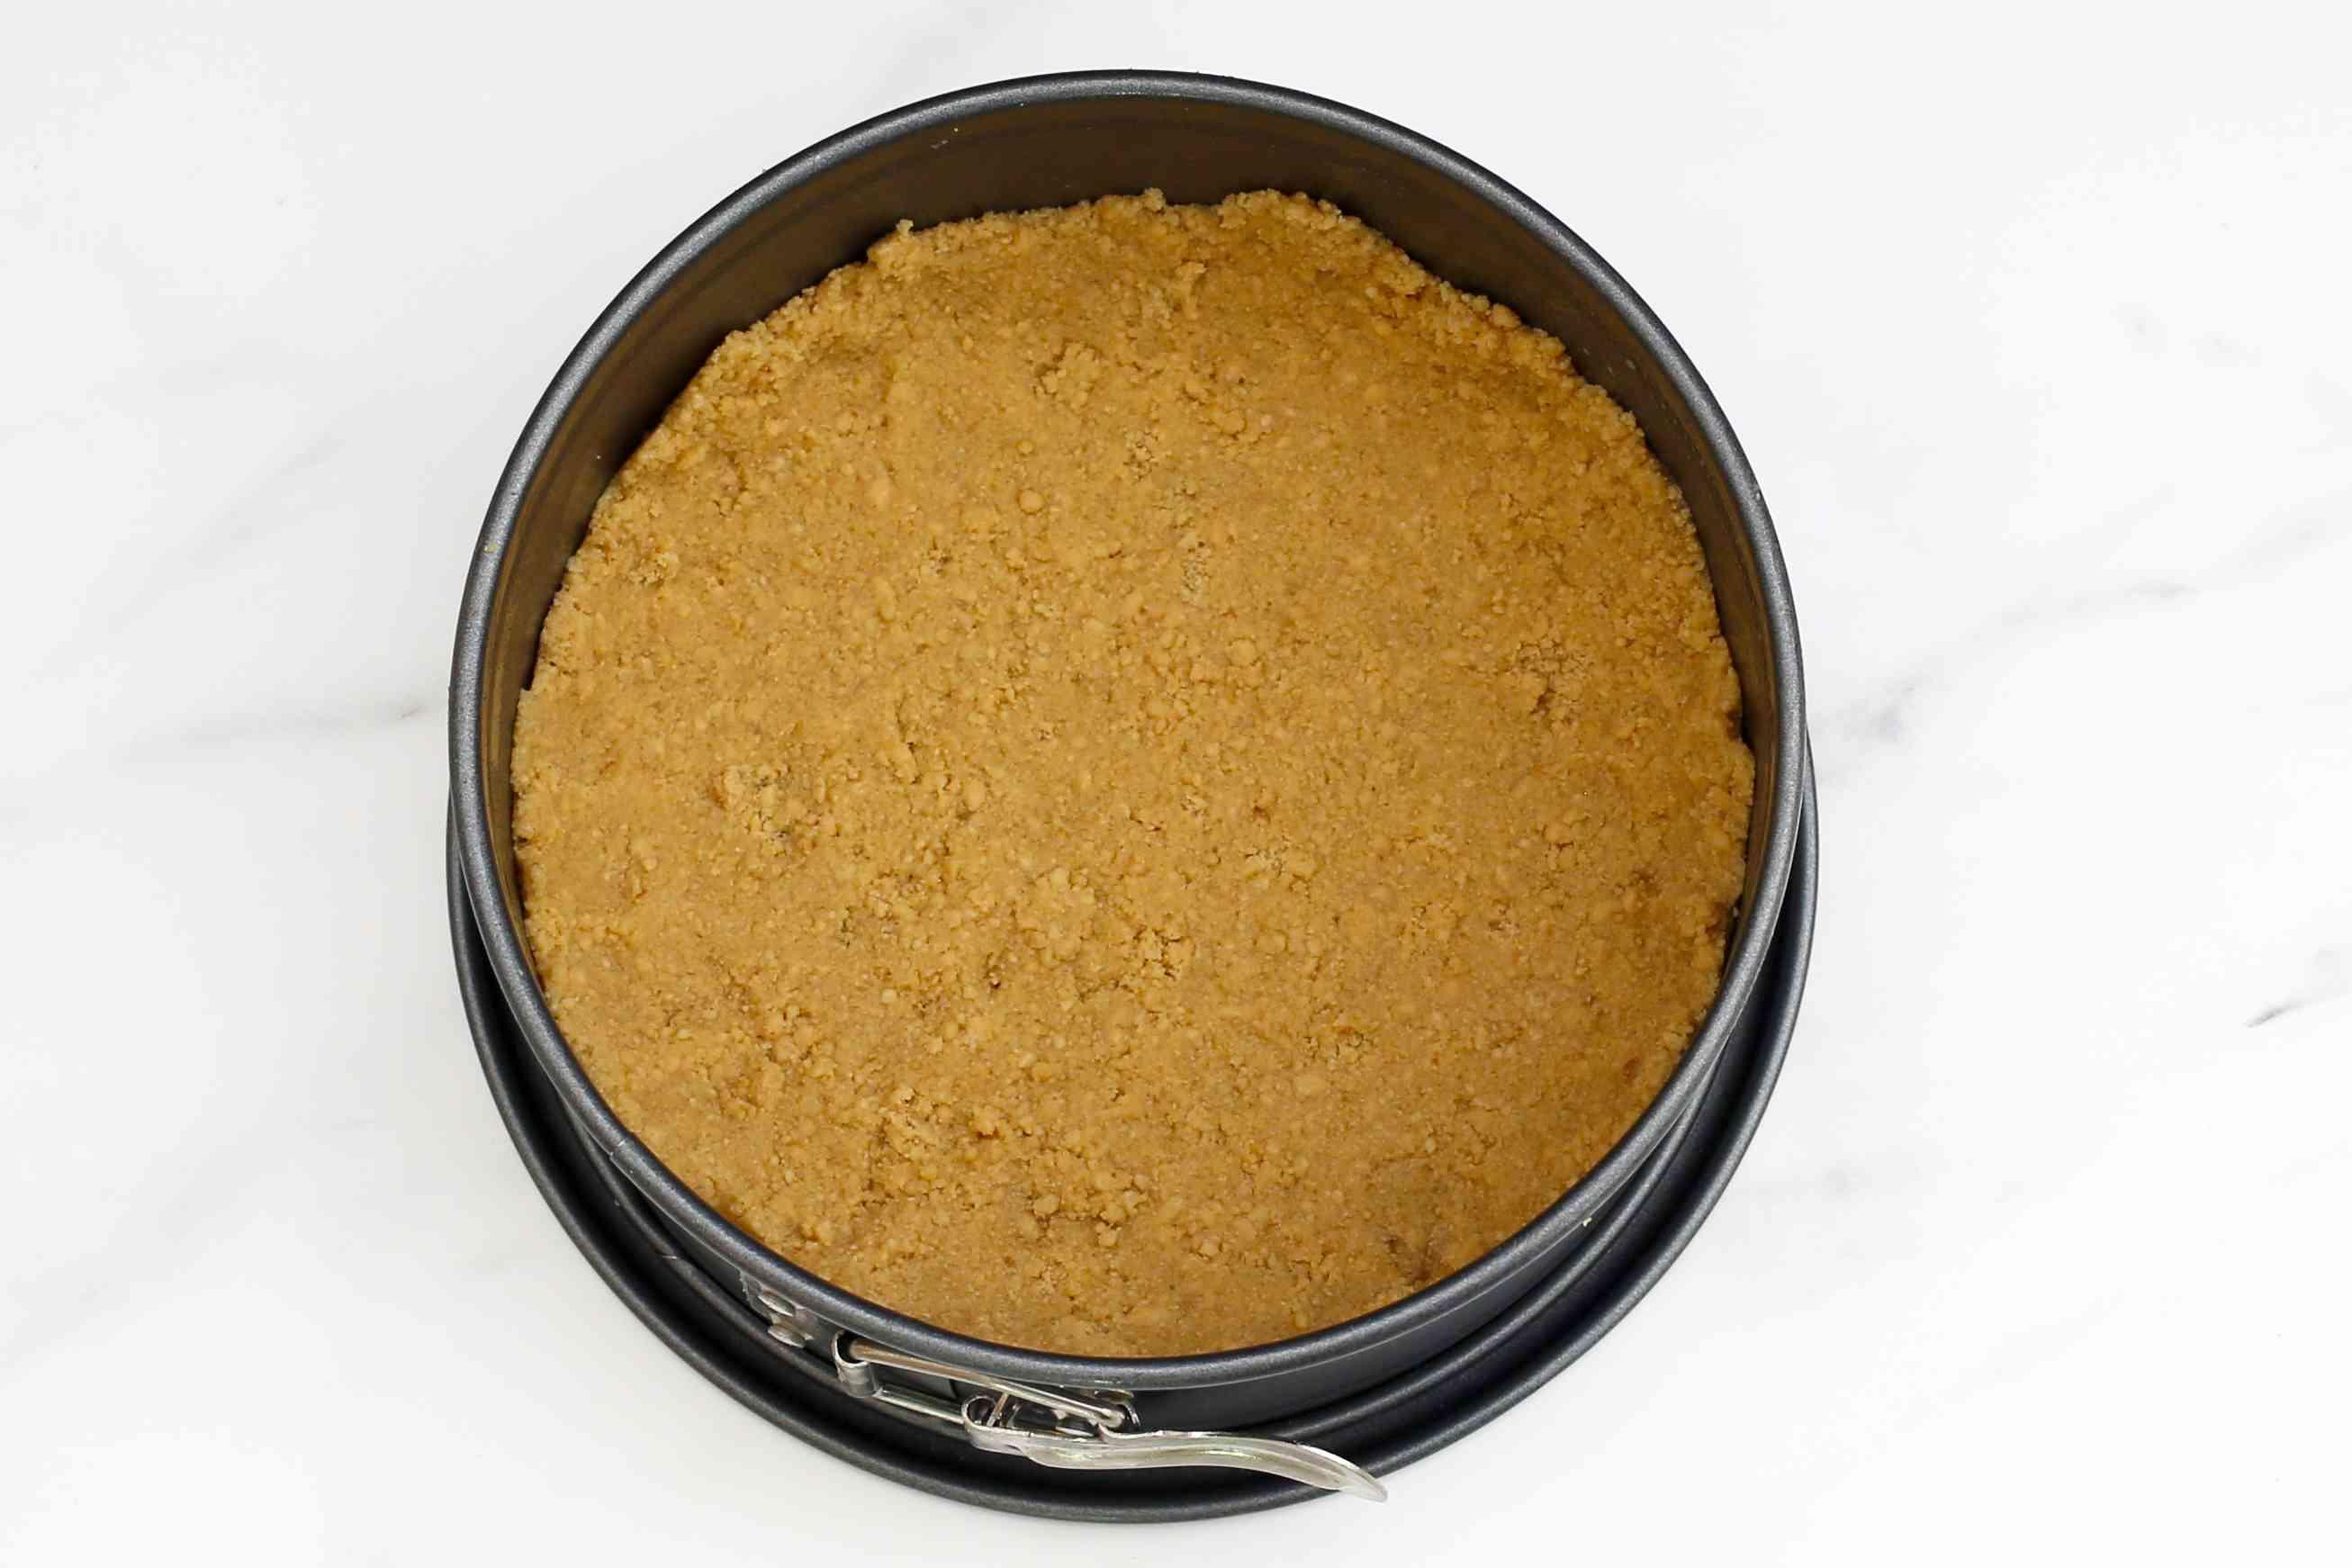 graham cracker crust in the pan